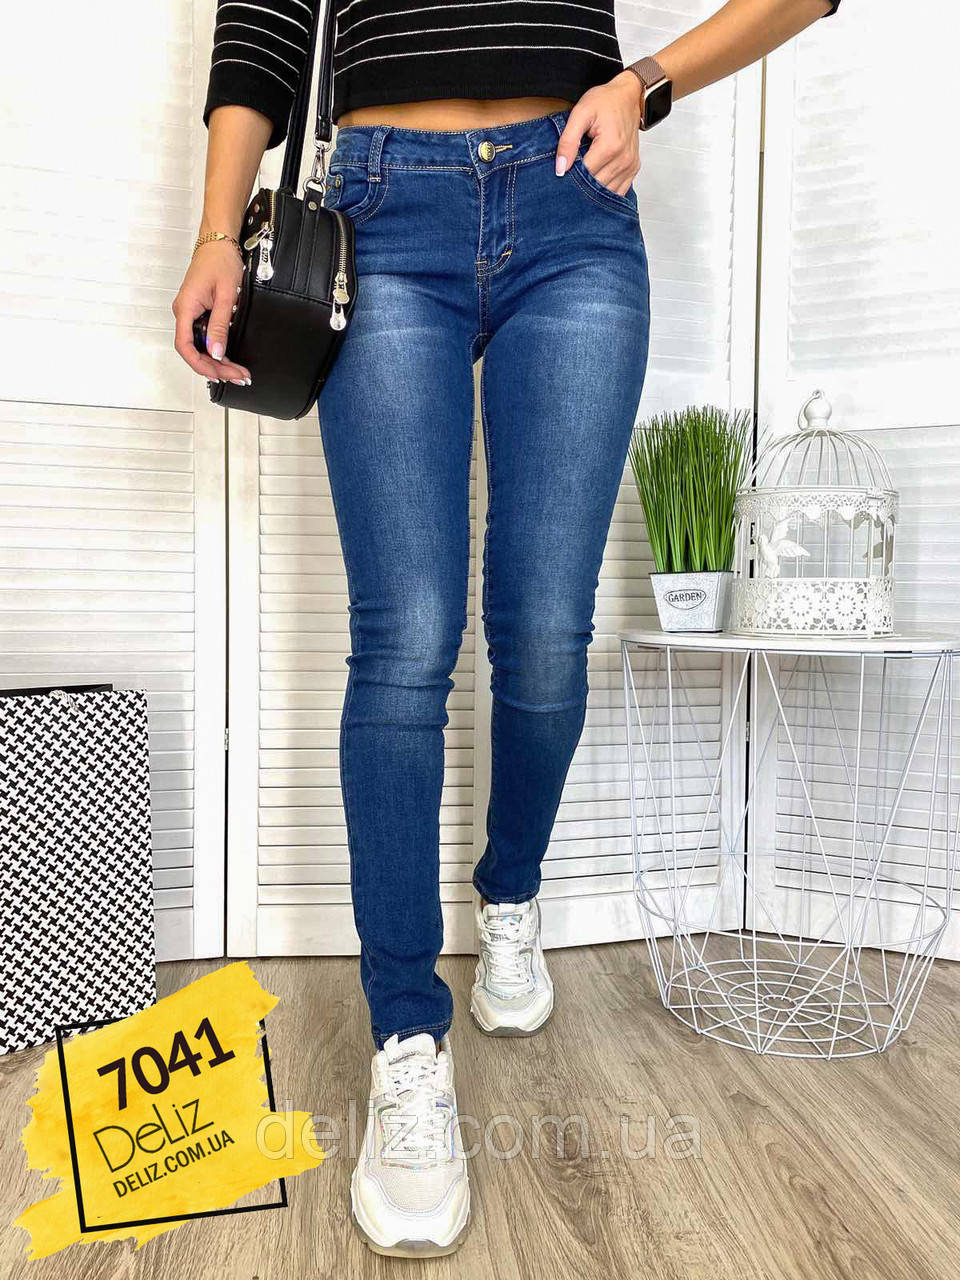 Зауженные джинсы X&D 7041. Размер 26 (маломер, на р.S / 42)